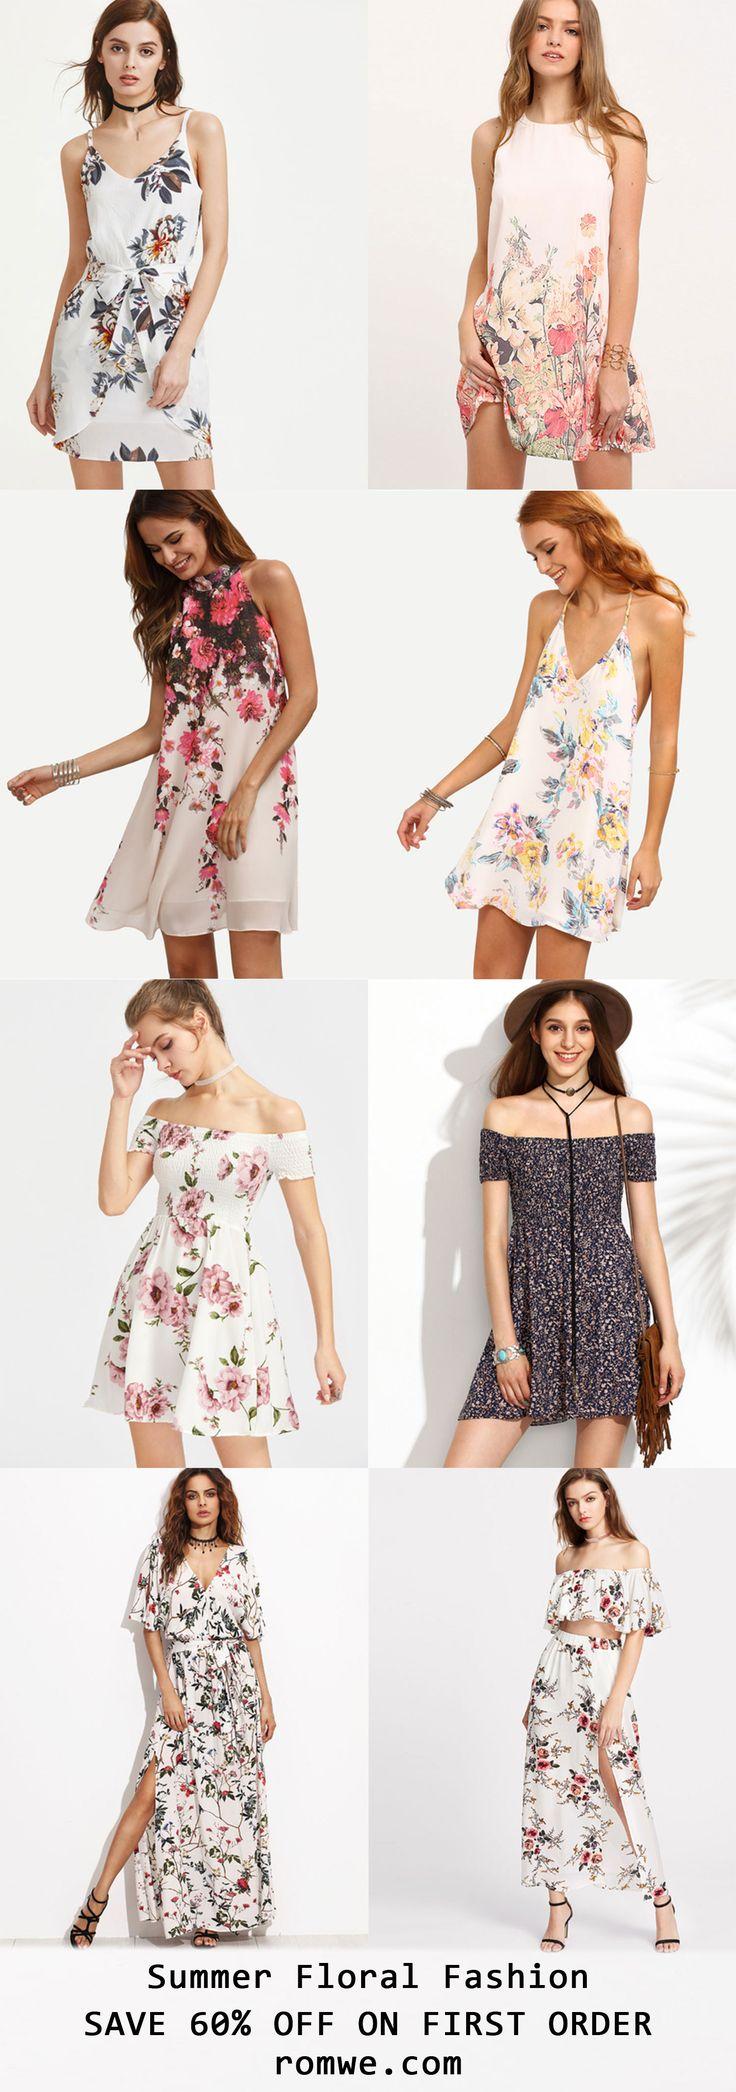 Summer Floral Fashion 2017 - romwe.com https://twitter.com/gaefaefagaea4/status/895099981215932416